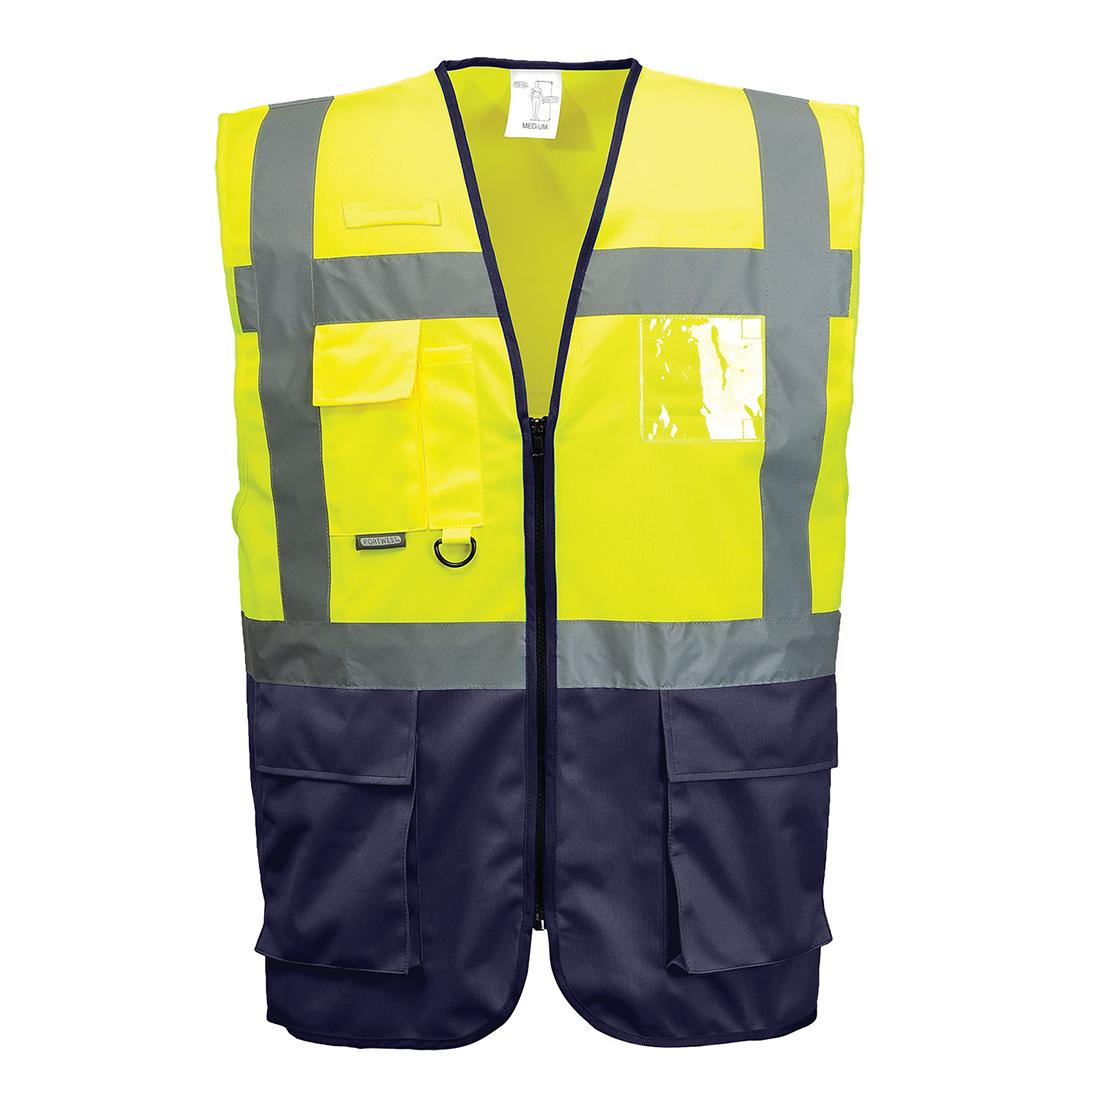 Portwest C497 High Visibility Hi-Vis Polycotton Safety Vest Orange or Yellow